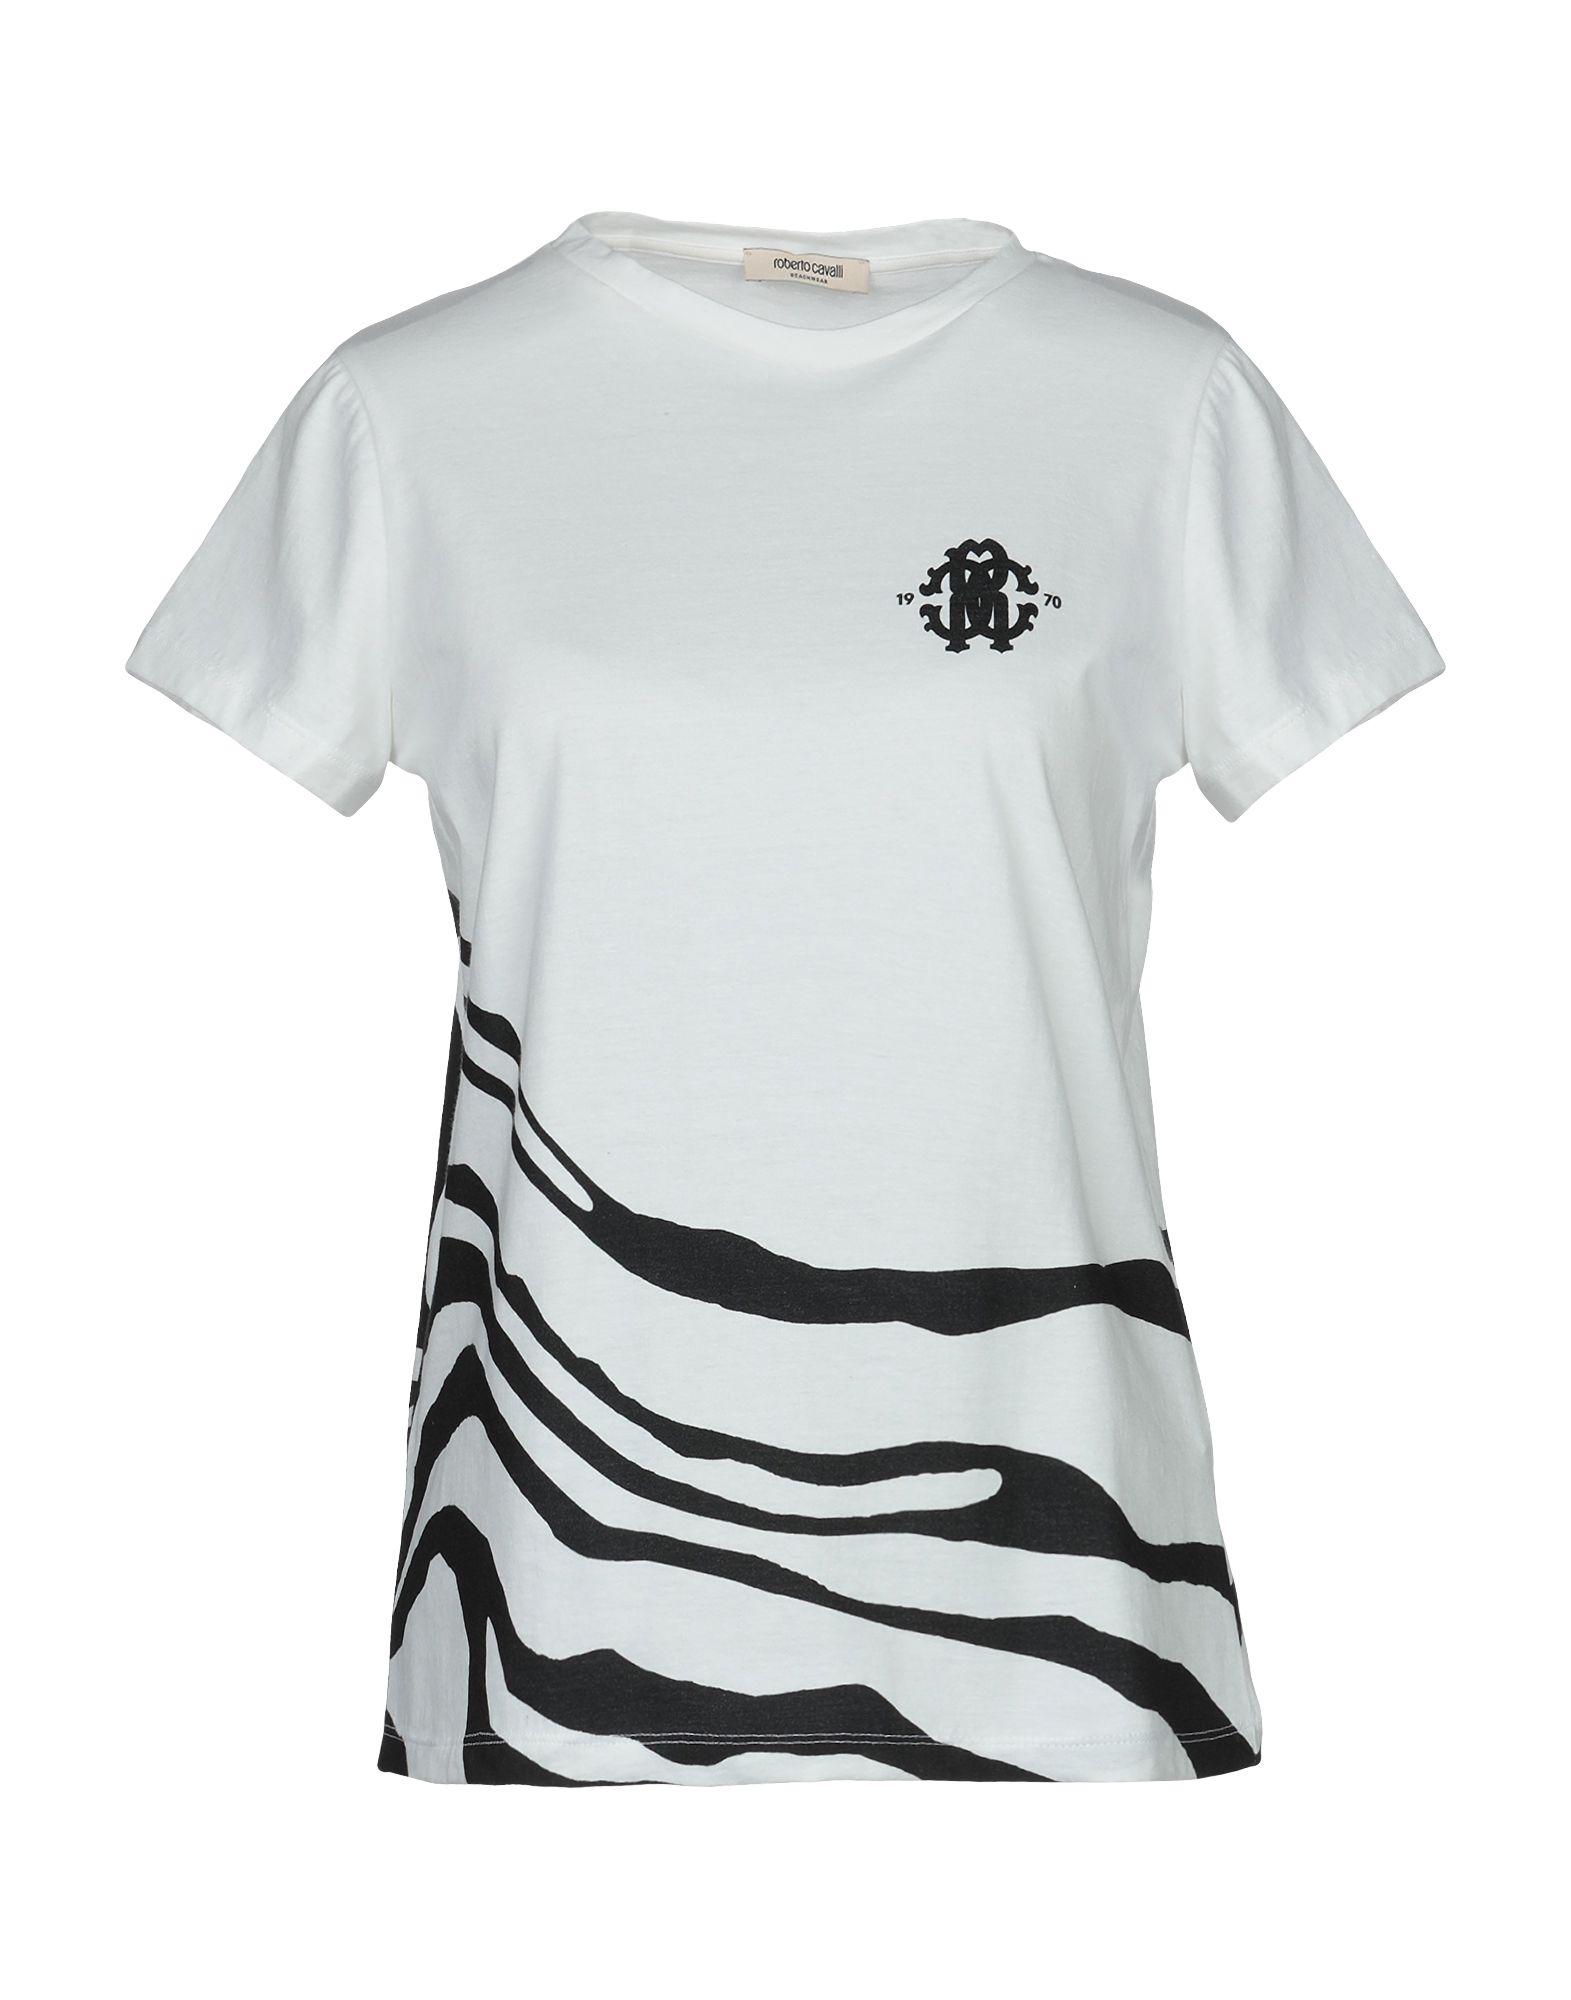 T-Shirt Roberto Cavalli donna donna - 12297507RL  rücksichtsvoller Service